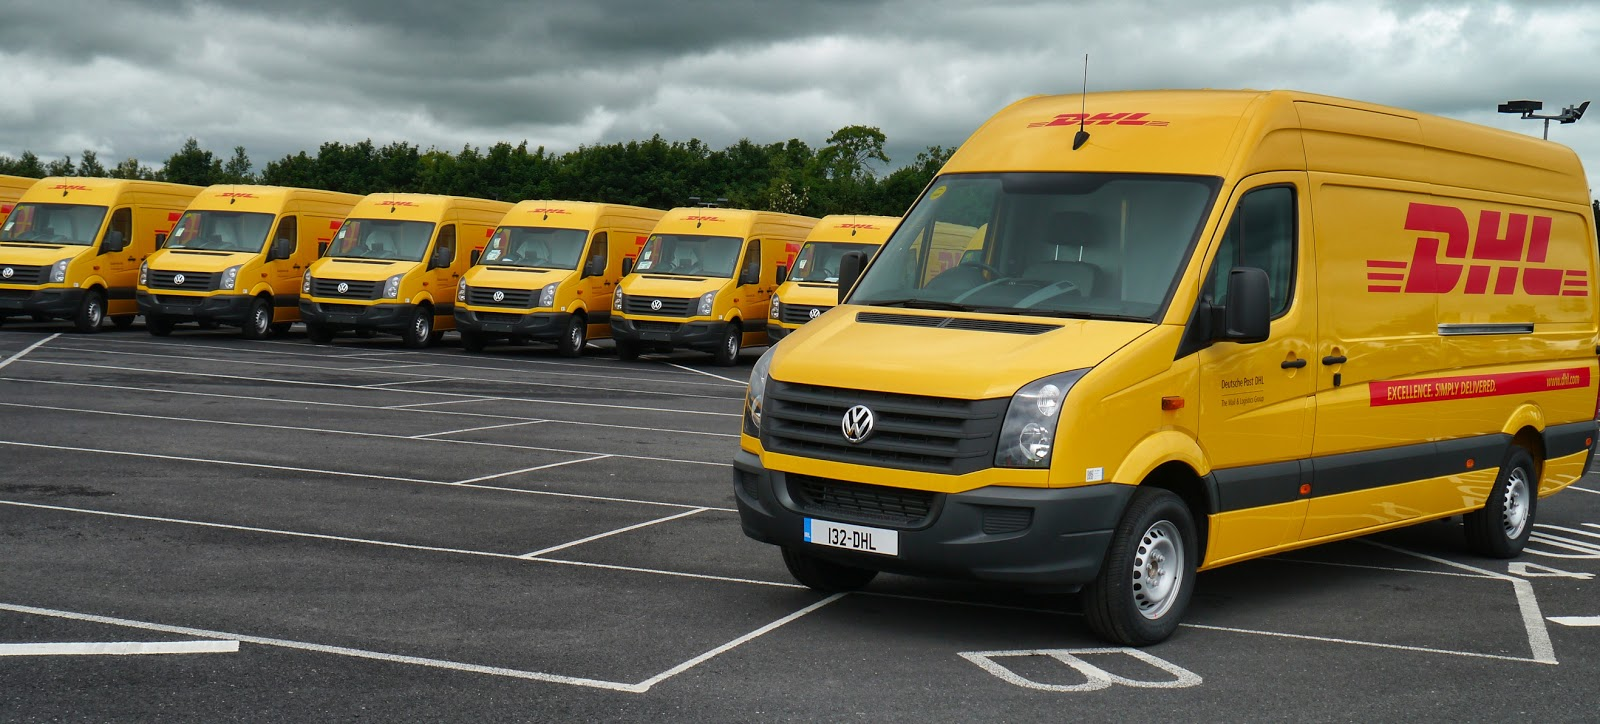 Bmw Sprinter Van >> Irish Car+Travel Magazine: DHL chooses VW Crafter